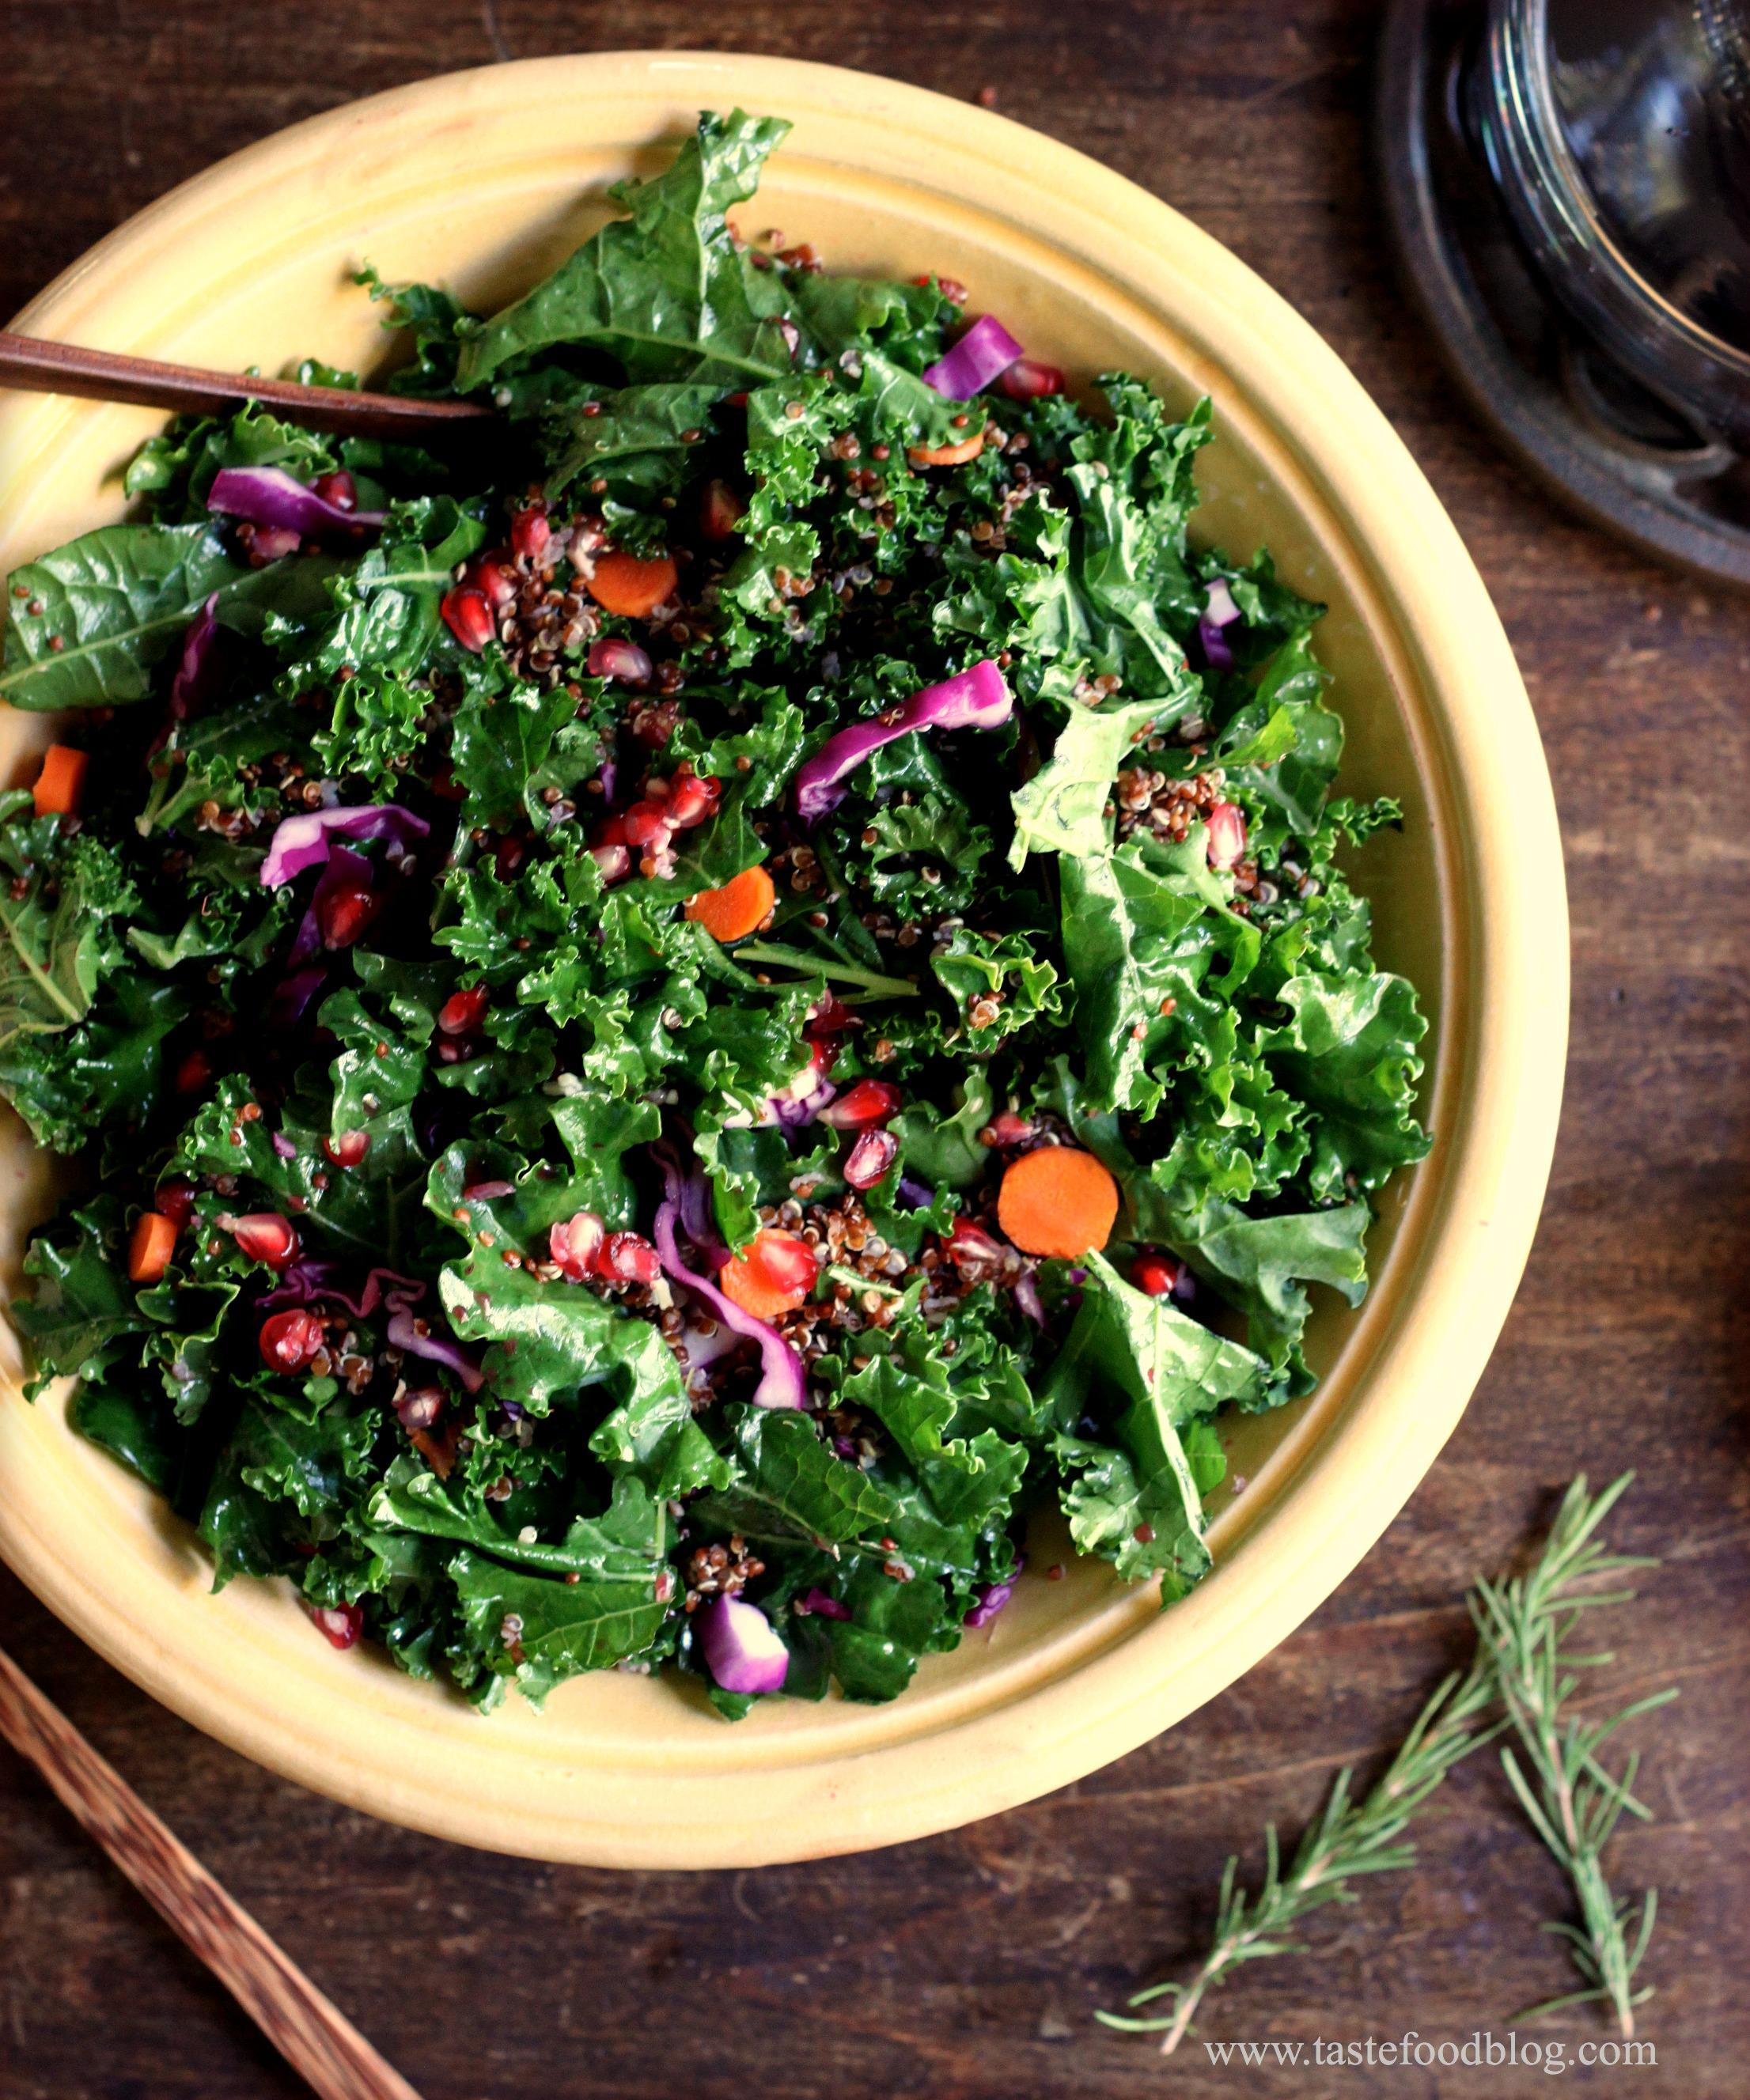 Kale, Red Cabbage, Quinoa, Carrots, Pomegranate, Raisins, Almonds ~